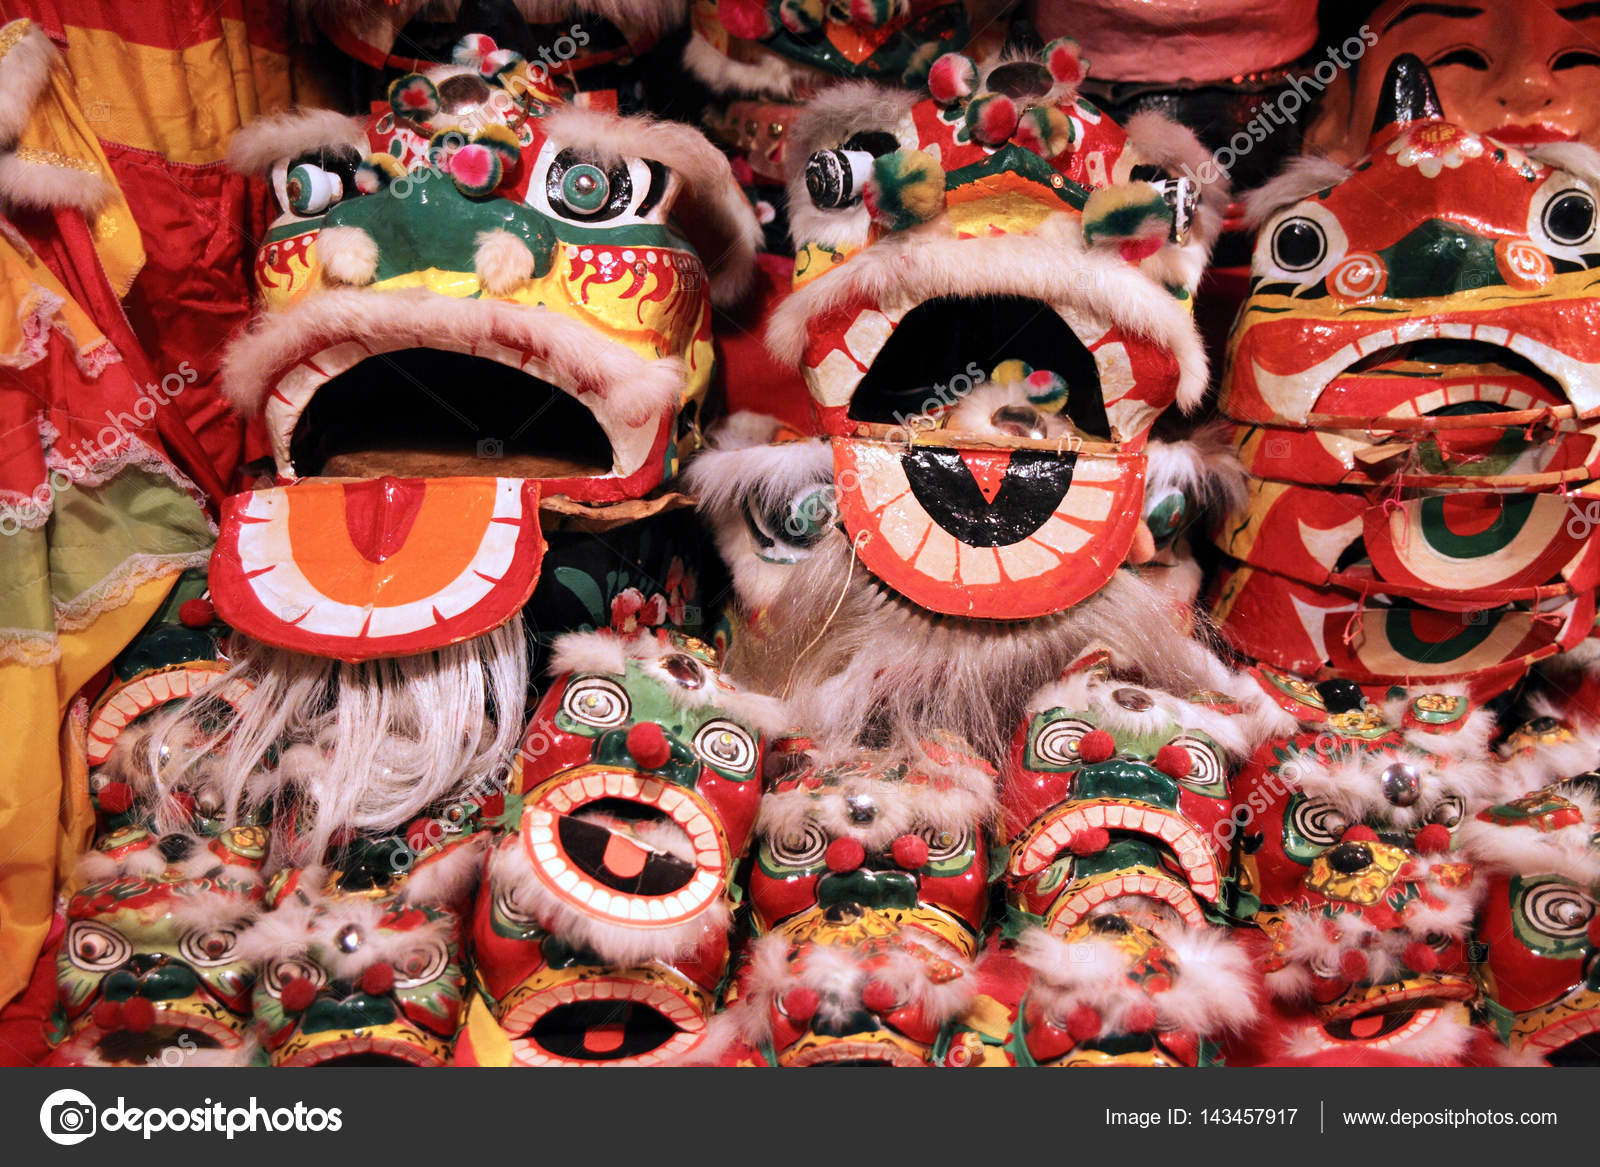 Foto Foto Juguetes Tradicionales Chinos— Chinos— Tradicionales Chinos— Tradicionales Juguetes Foto Juguetes Juguetes Tradicionales KTJ1cFl